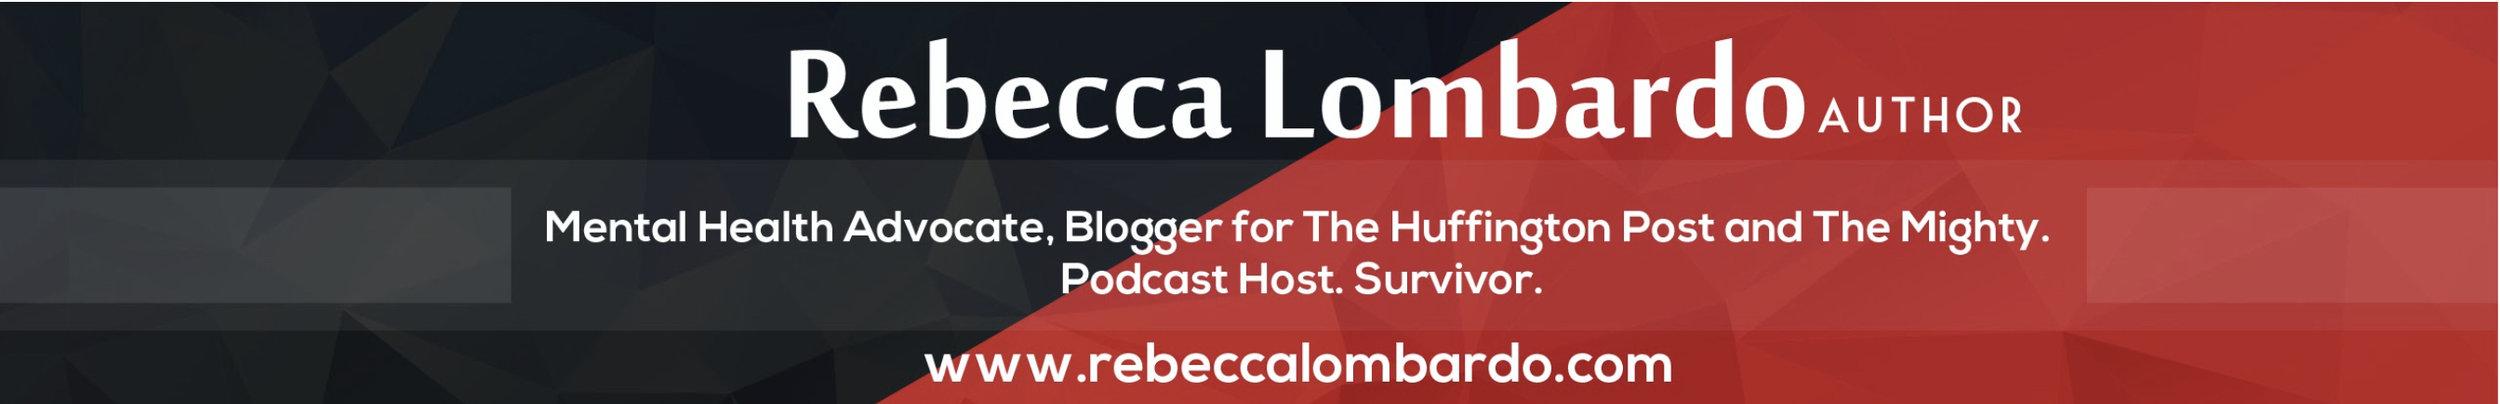 Rebecca Lombardo's YouTube Channel  • You can learn more about Rebecca's work at  rebeccalombardo.com